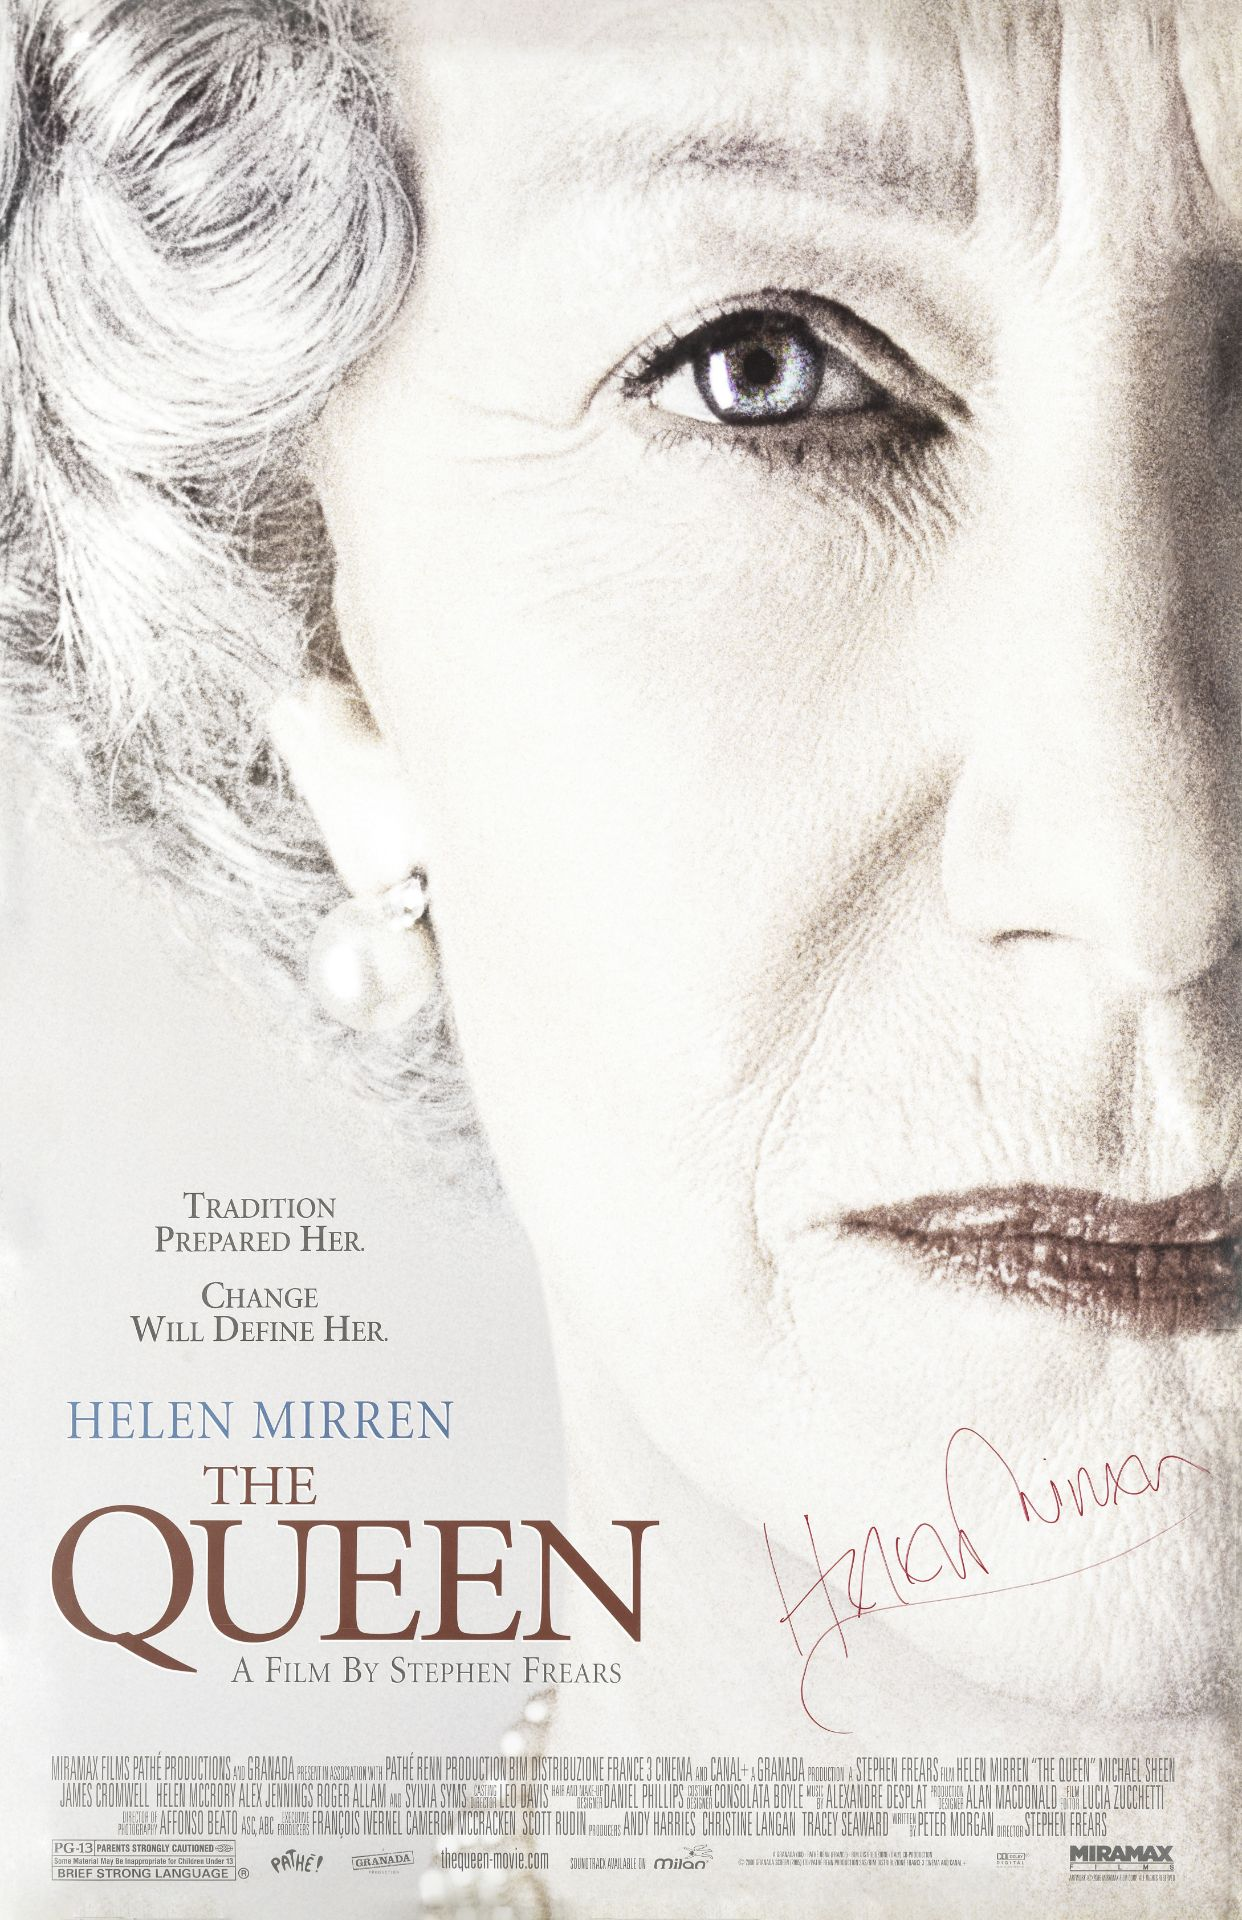 The Queen: A poster signed by Helen Mirren, Miramax, 2006,